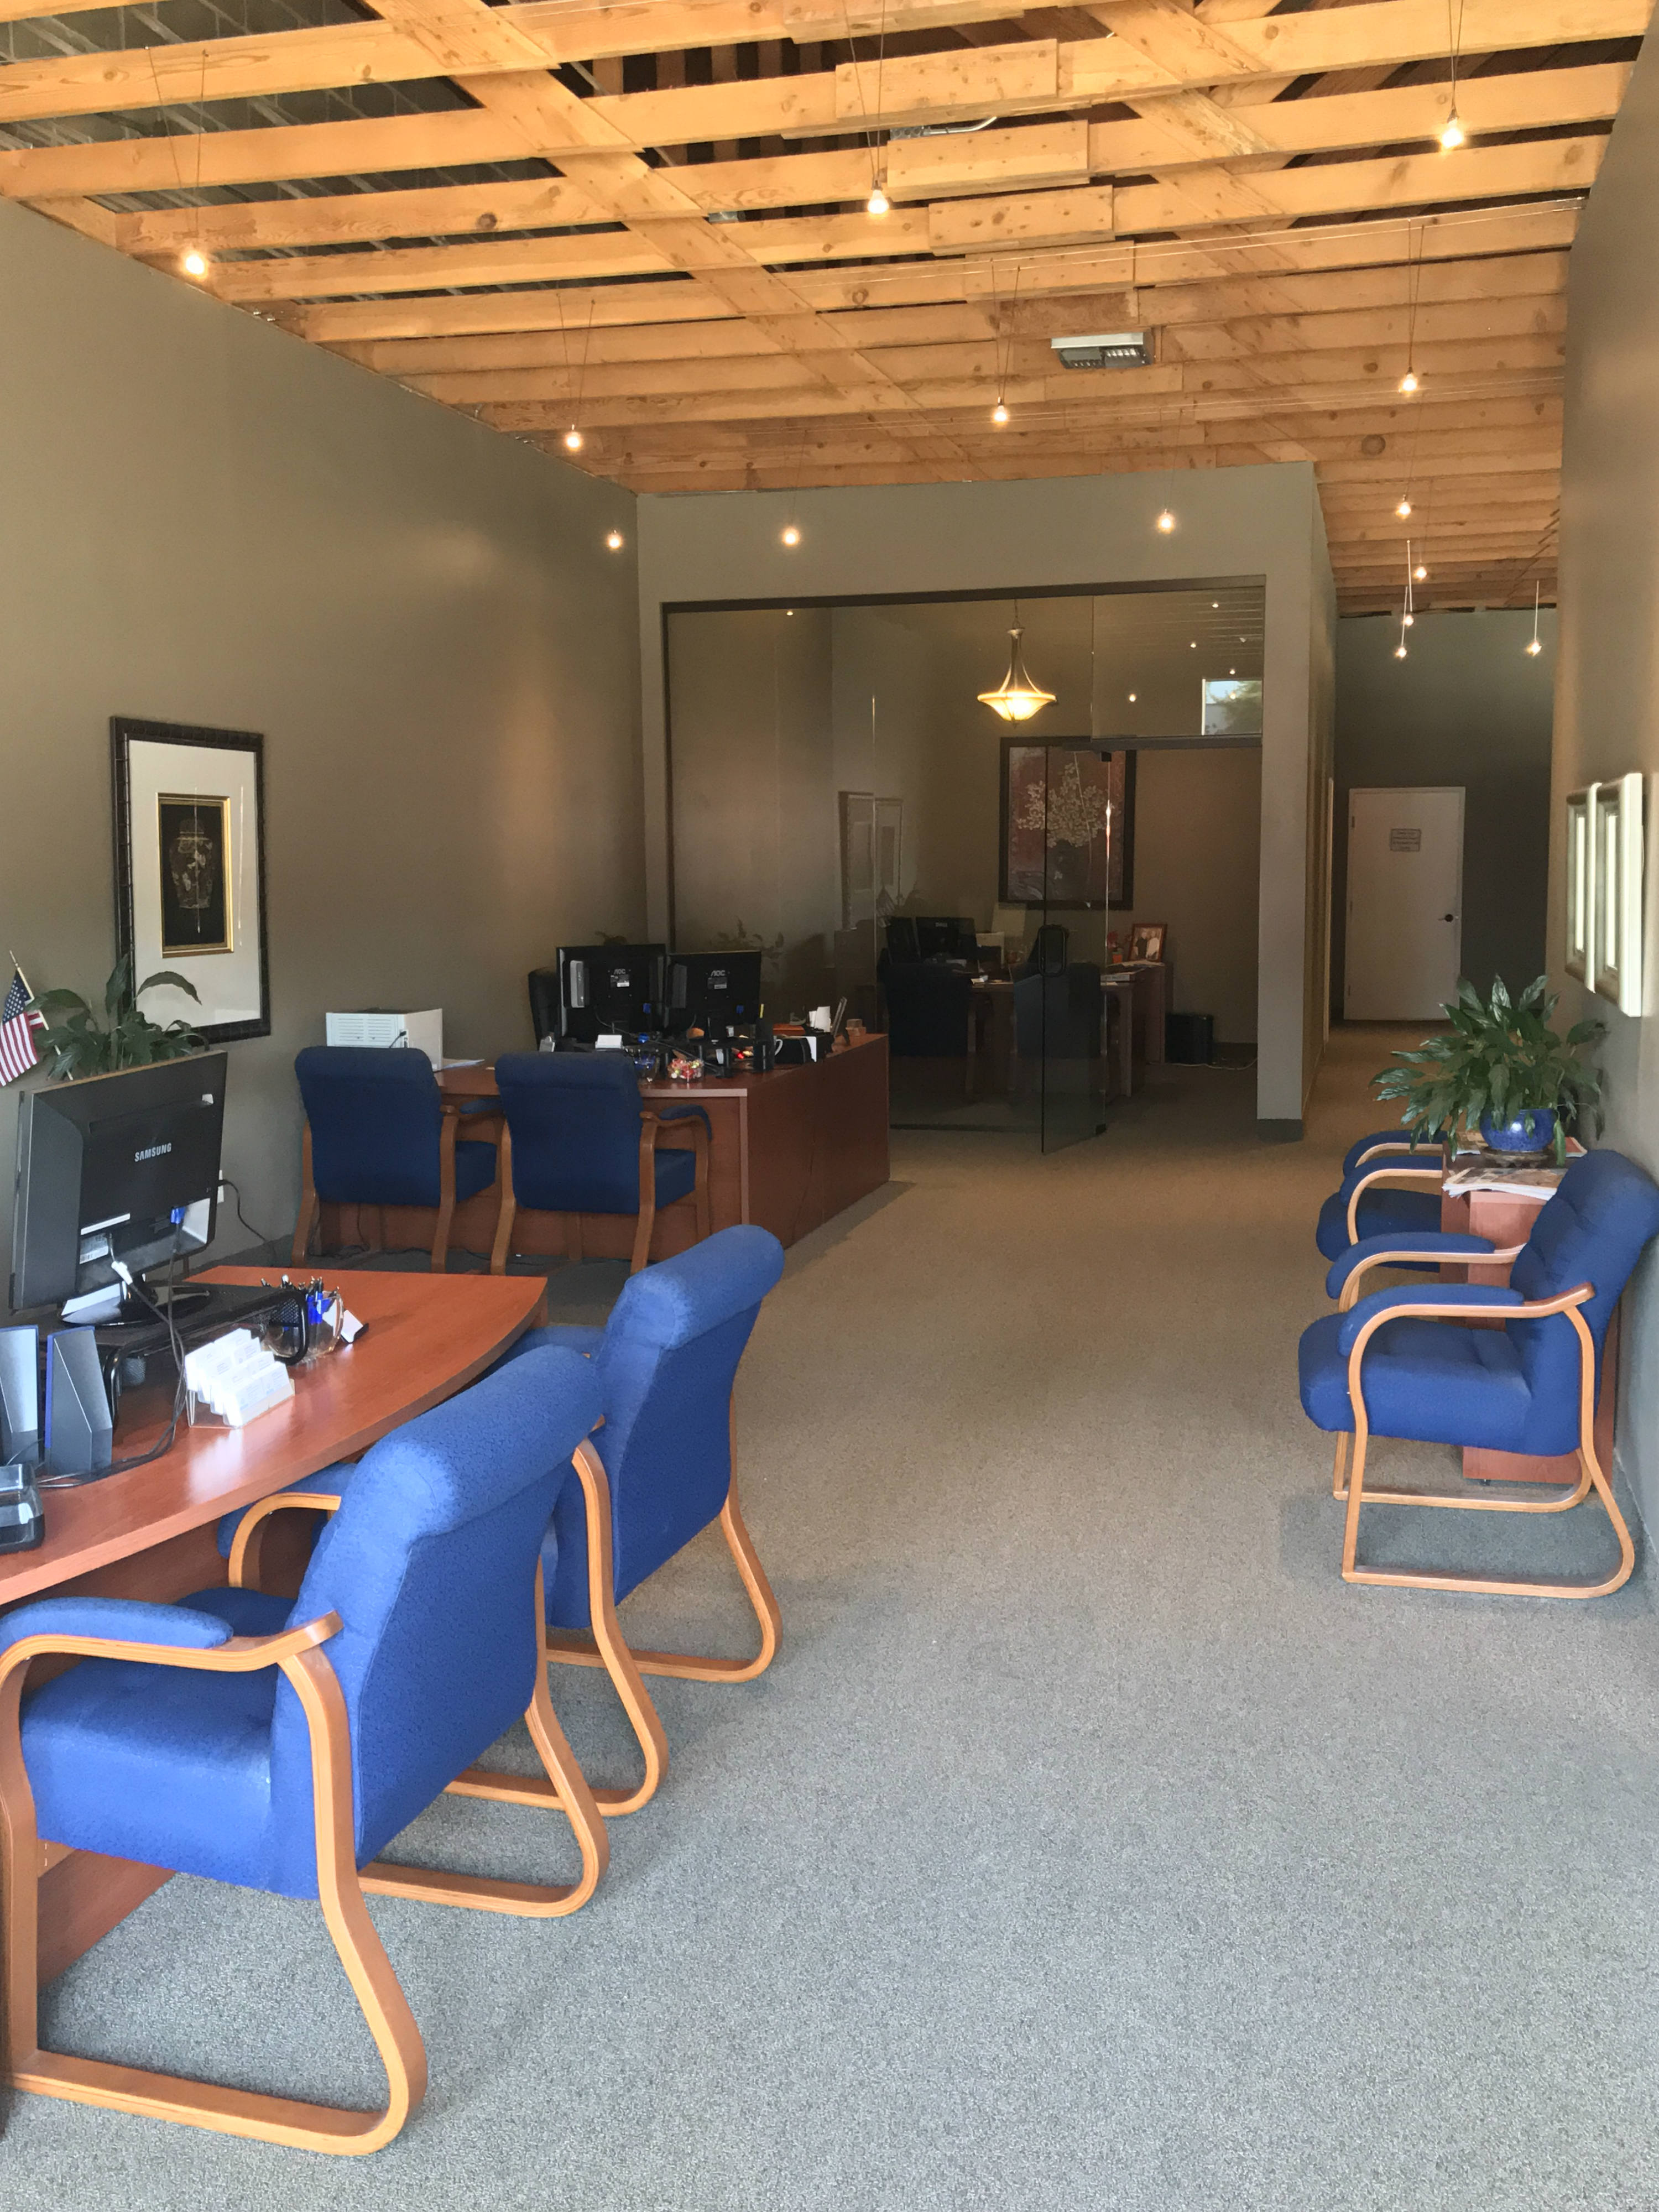 Jeff Becker: Allstate Insurance image 2